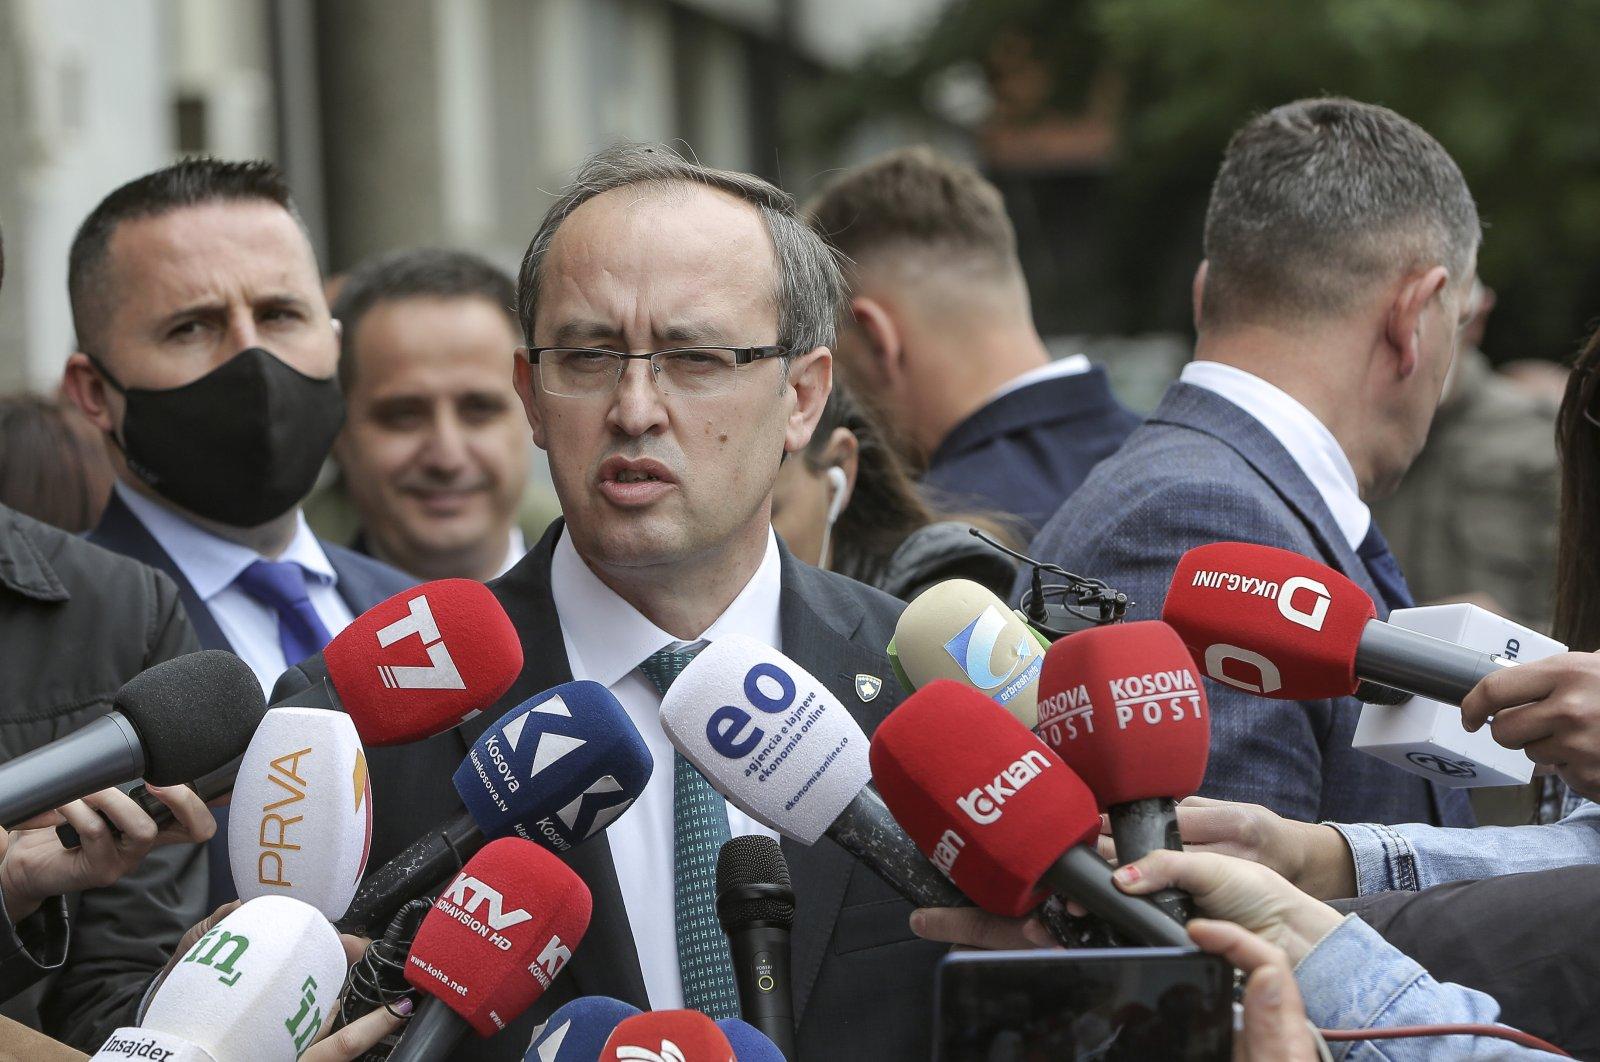 Newly elected Prime Minister Avdullah Hoti, speaks to the media in the capital Pristina, Kosovo, June 3, 2020. (AP Photo)